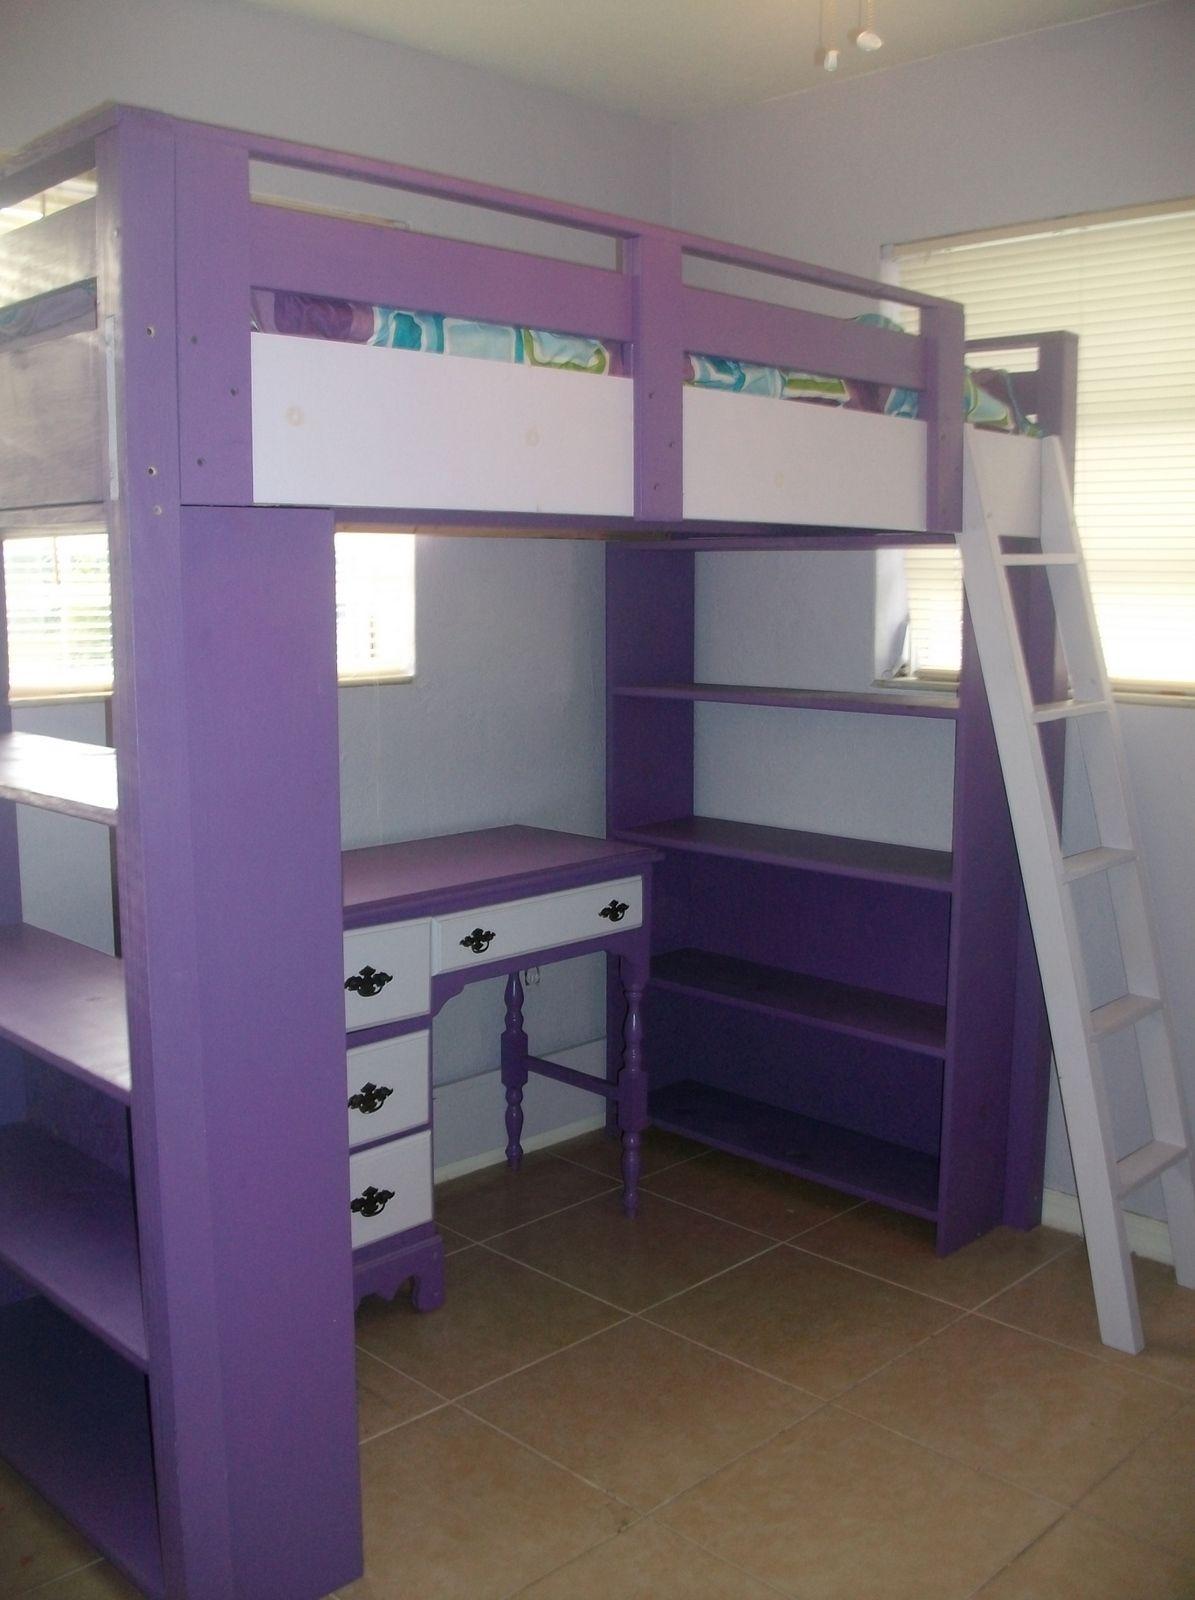 Diy kids loft bed plans  diy loft bed plans with a desk under  Purple Loft Bed with